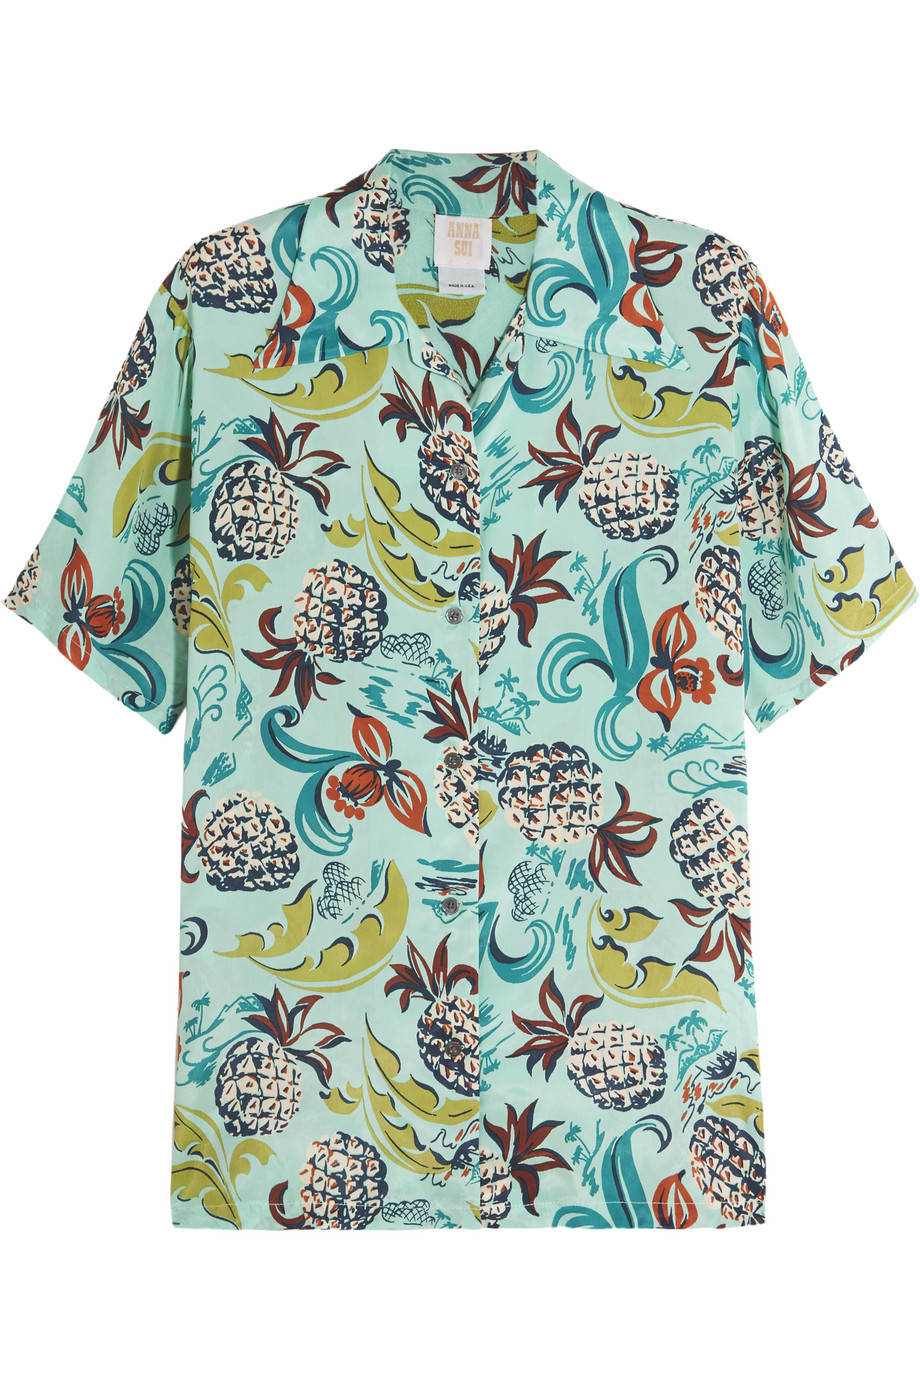 Anna Sui Printed Crepe De Chine Shirt, Sky Blue, Women's, Size: M